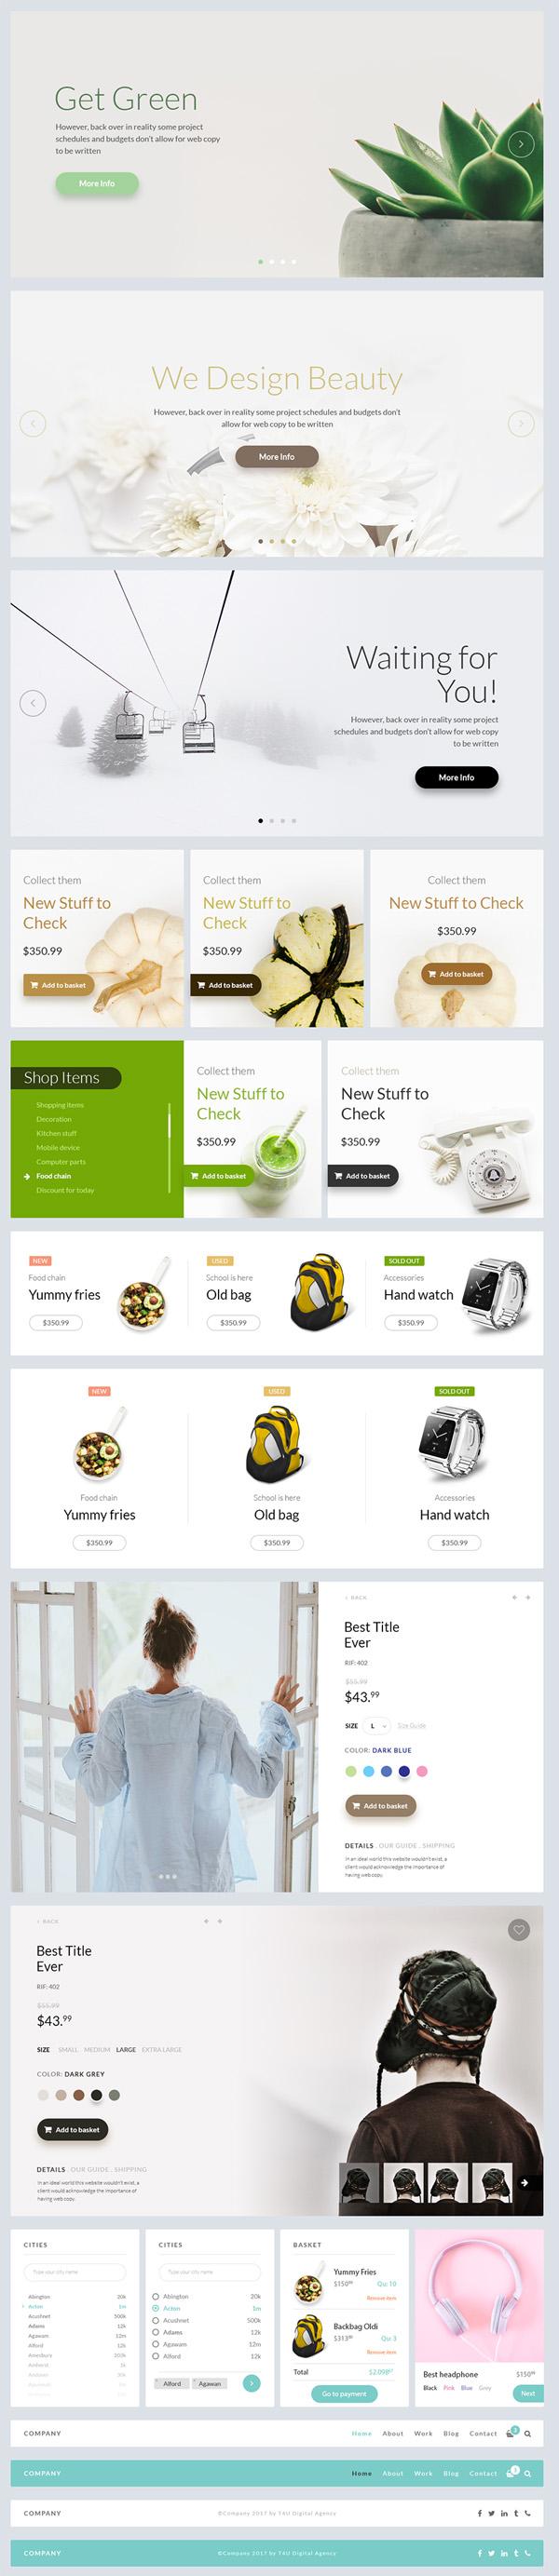 Free Web UI Kit PSD